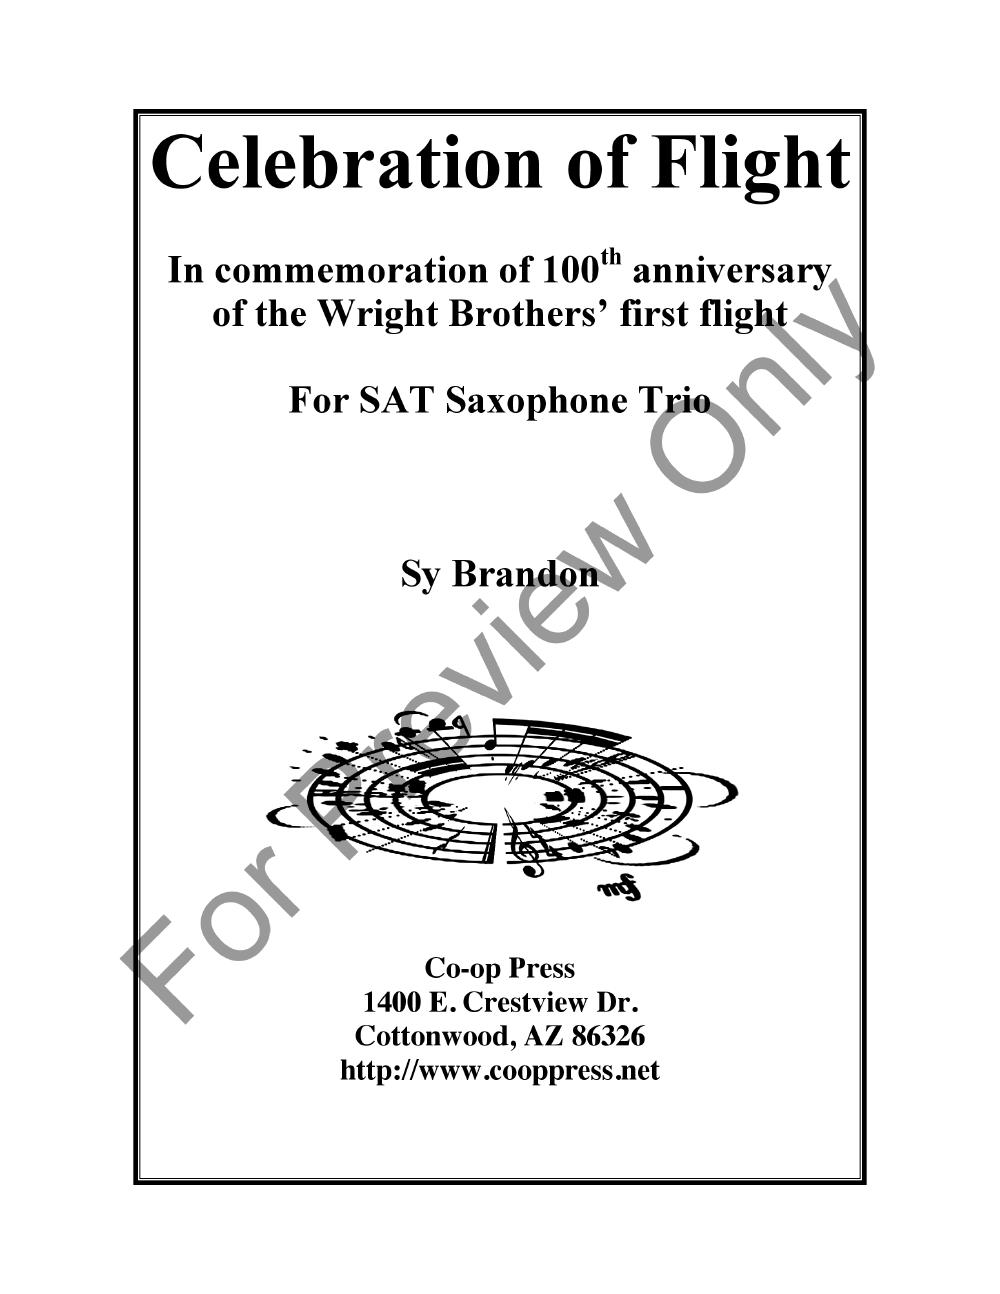 Celebration of Flight Thumbnail